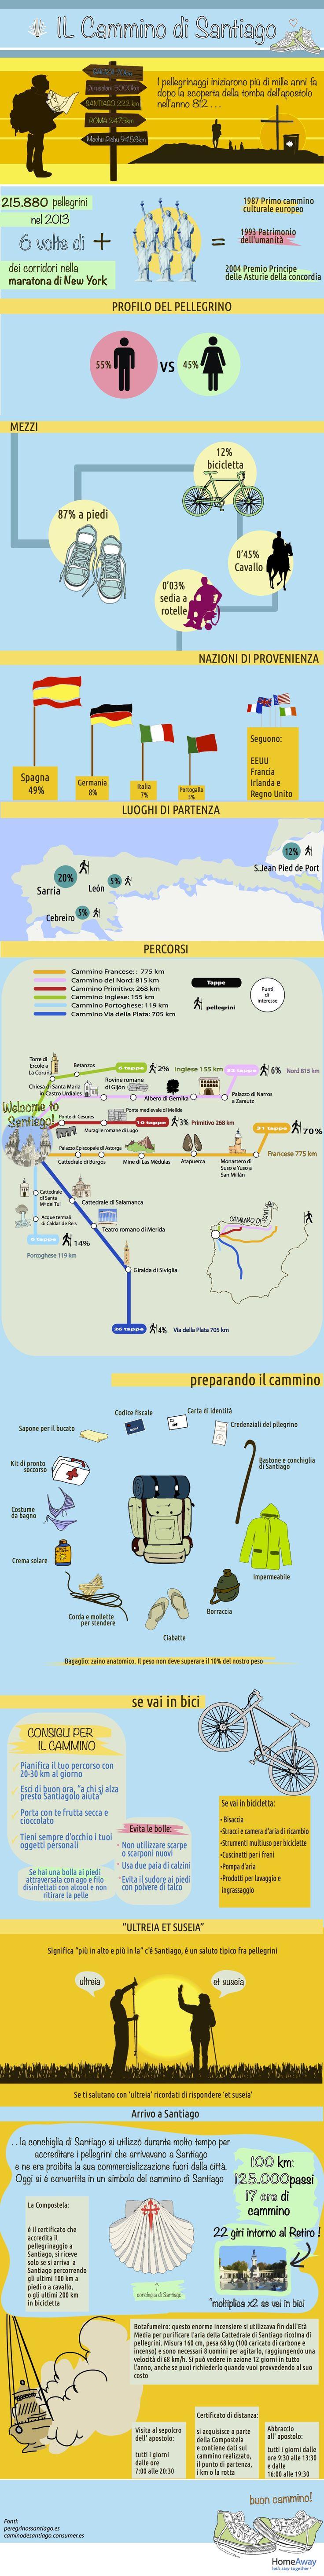 SAINT-JAMES WAY, Italian infos - Spain - Galicia